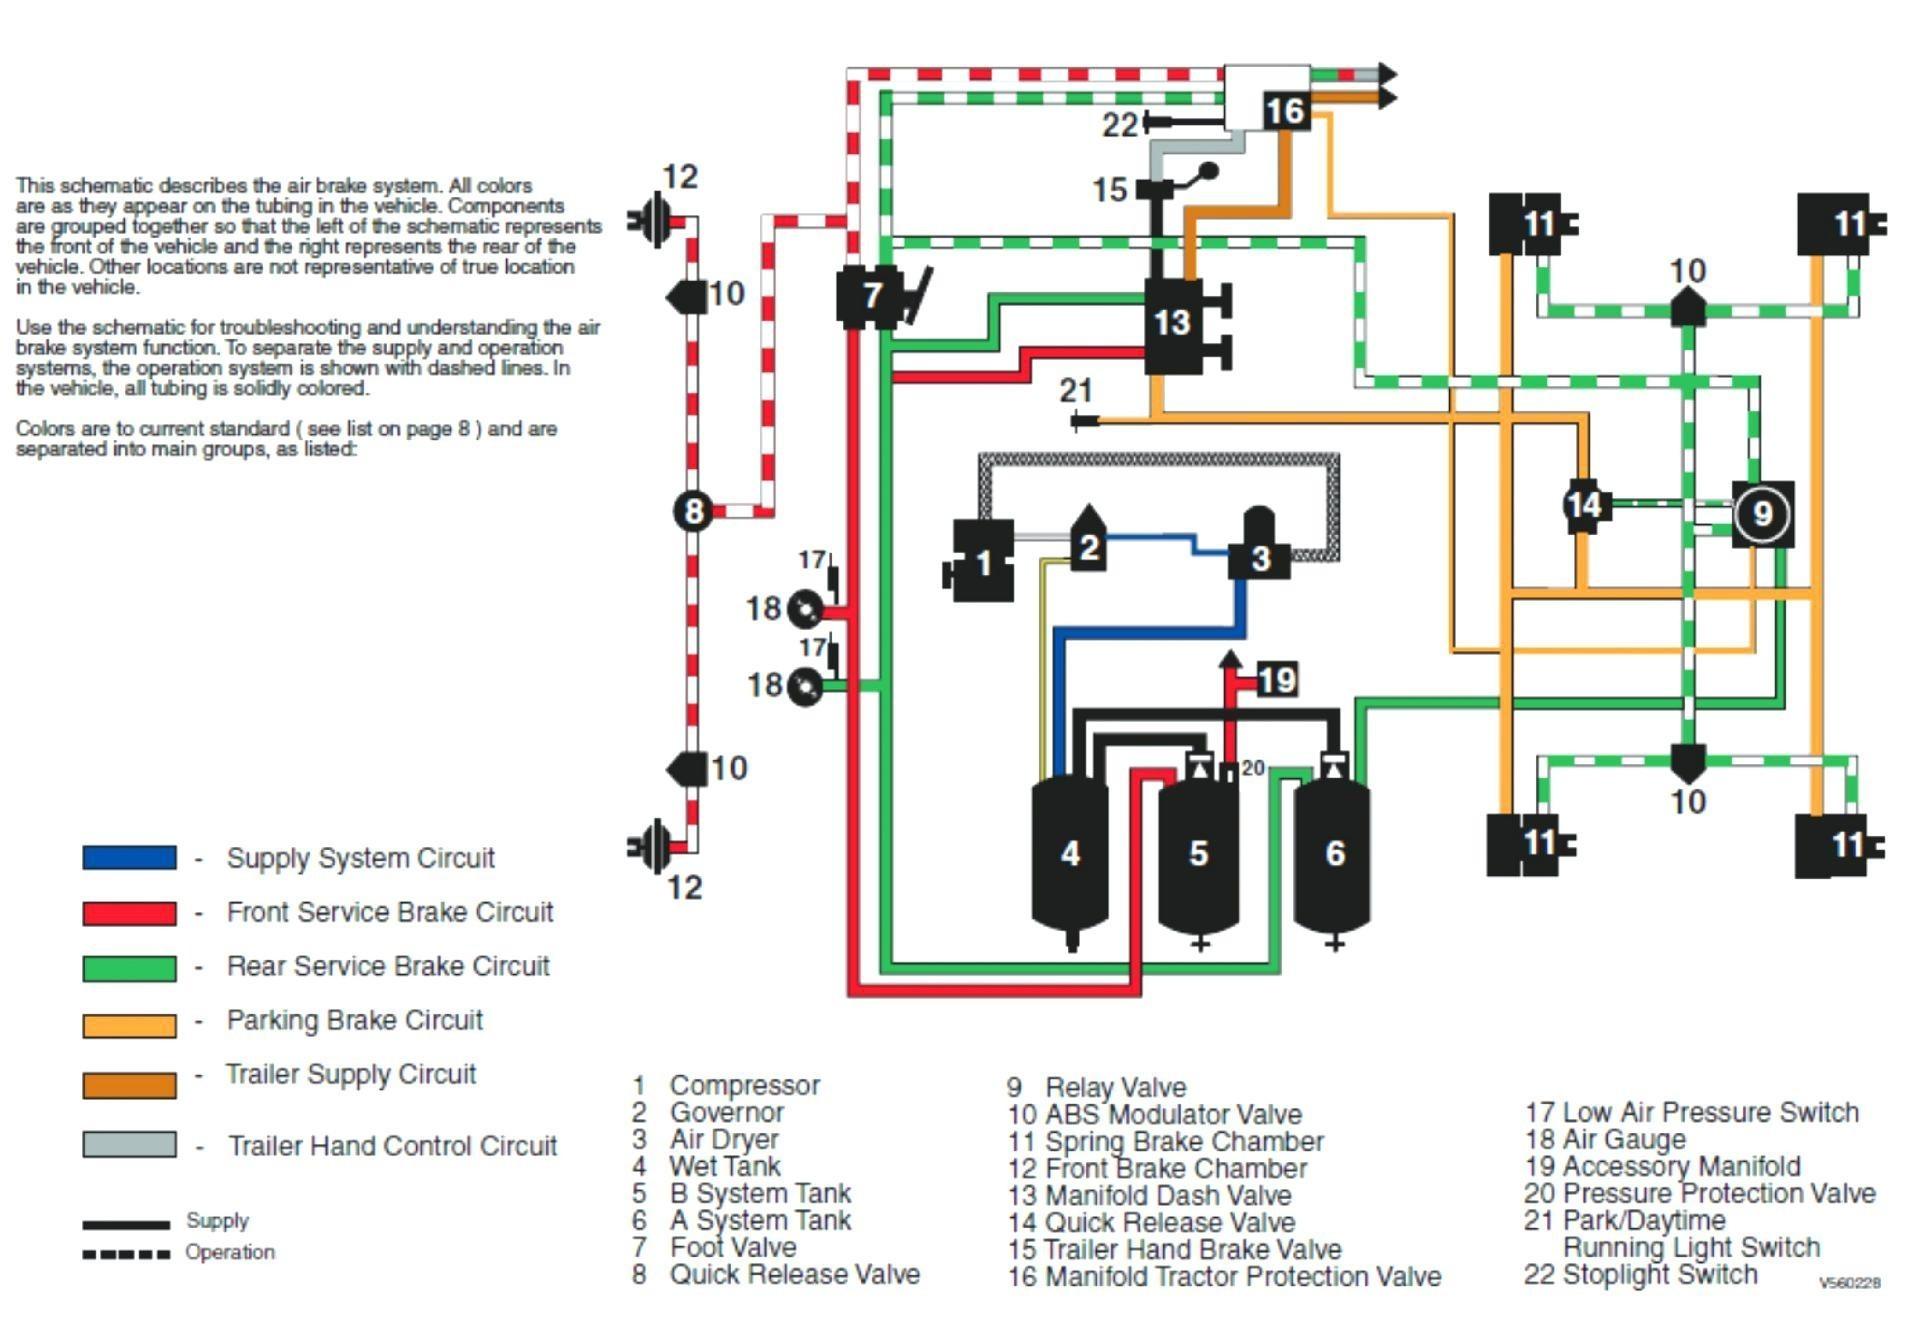 2 Axle Trailer Brake Wiring Diagram Wiring Diagram for Tandem Axle Trailer New Wiring Diagram